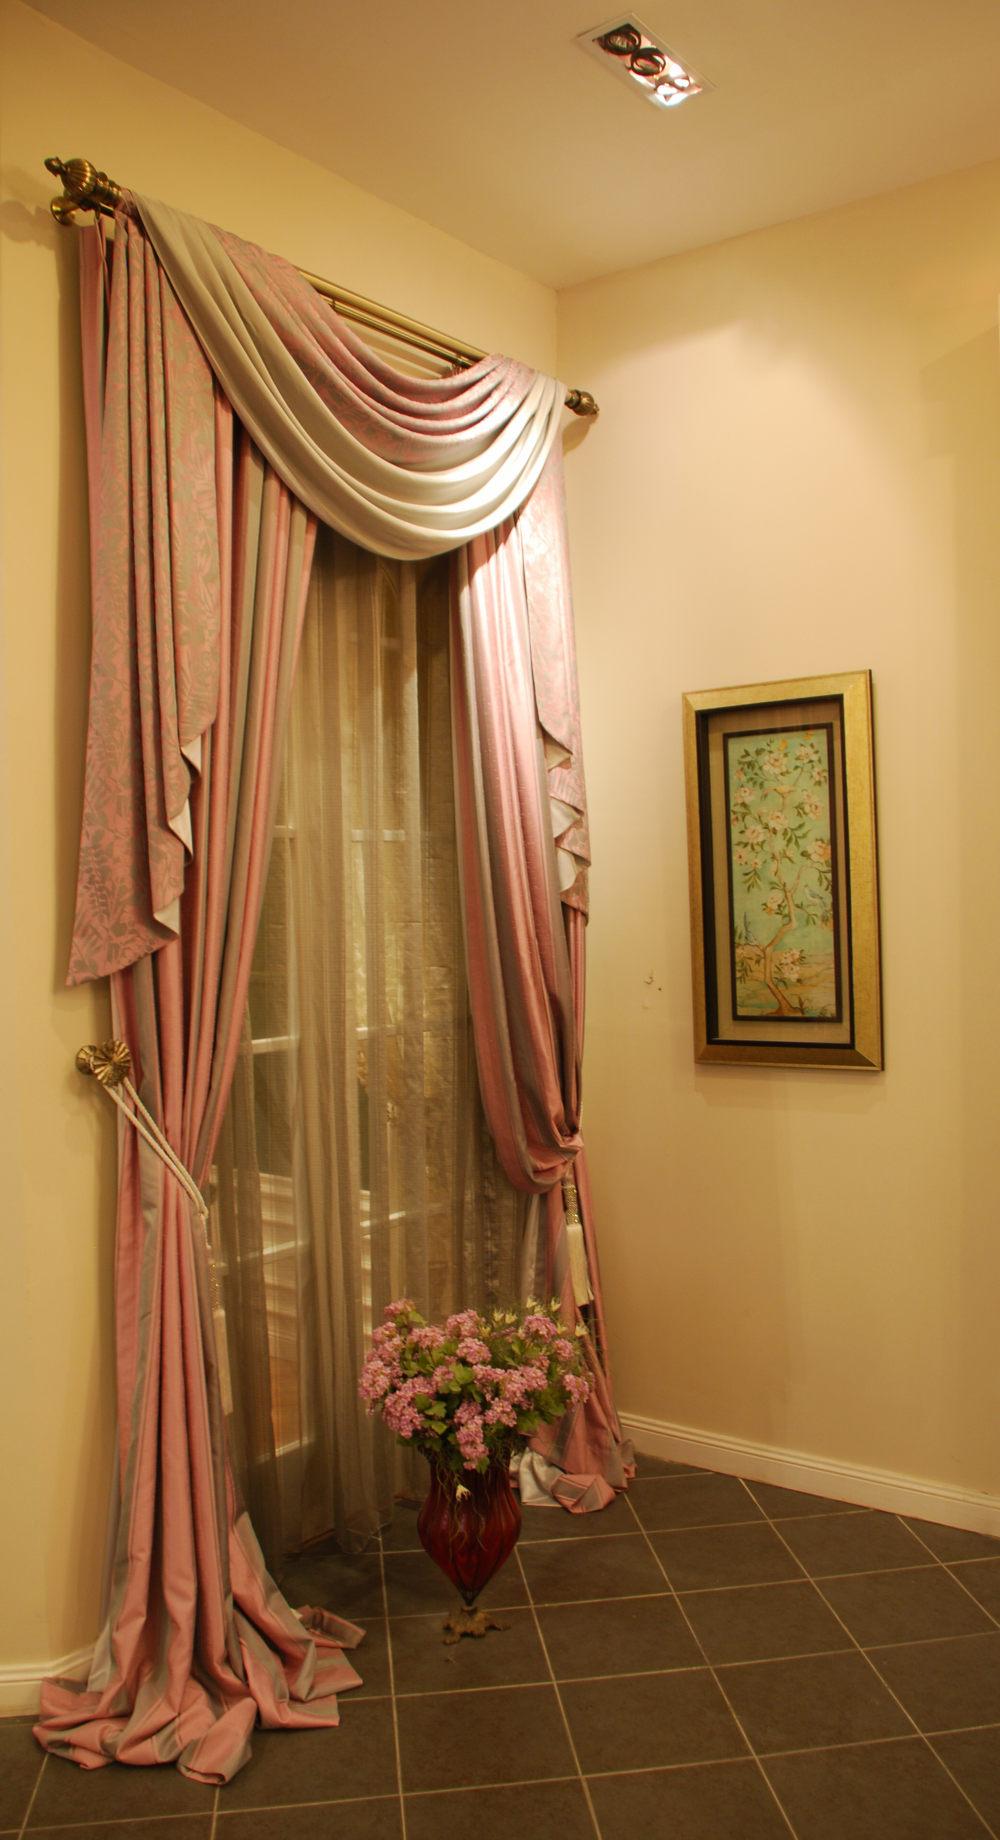 Aiden 收藏窗帘图片高清图(用方案里很清晰。)免费~_DSC_0358.JPG